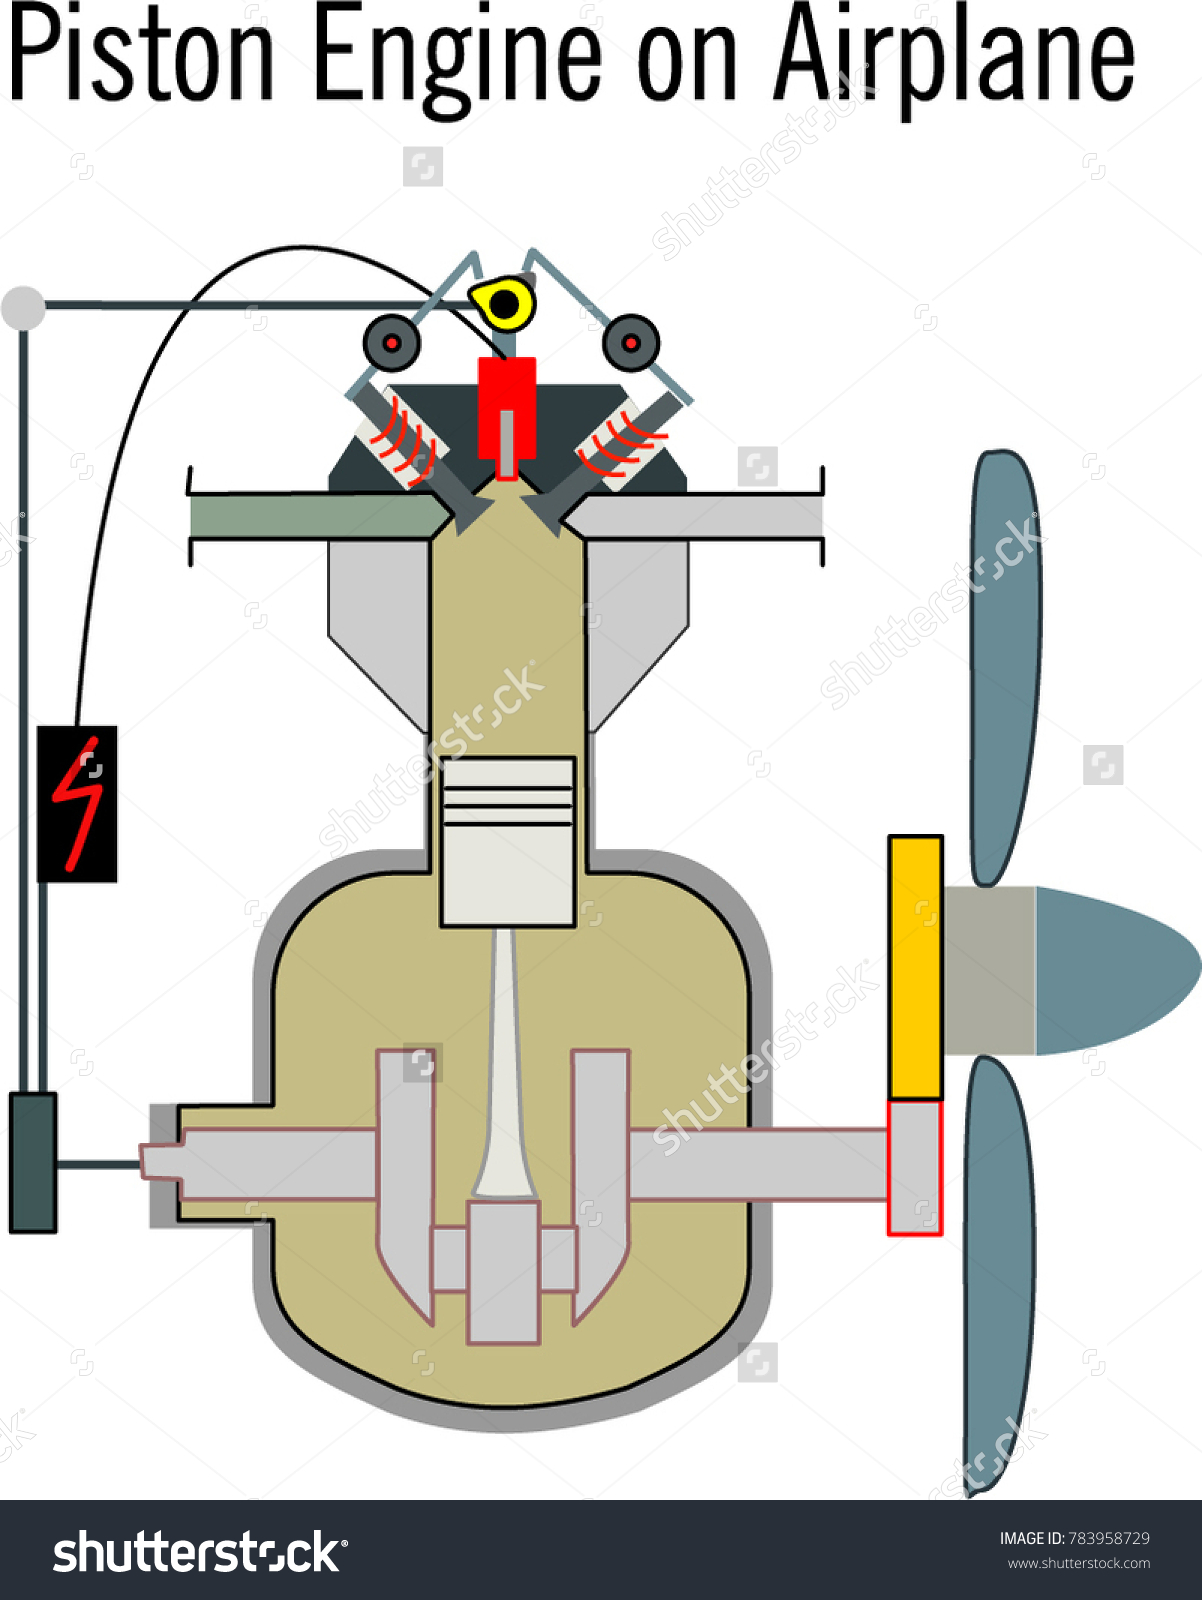 Piston engine for airplane, cartoon engine